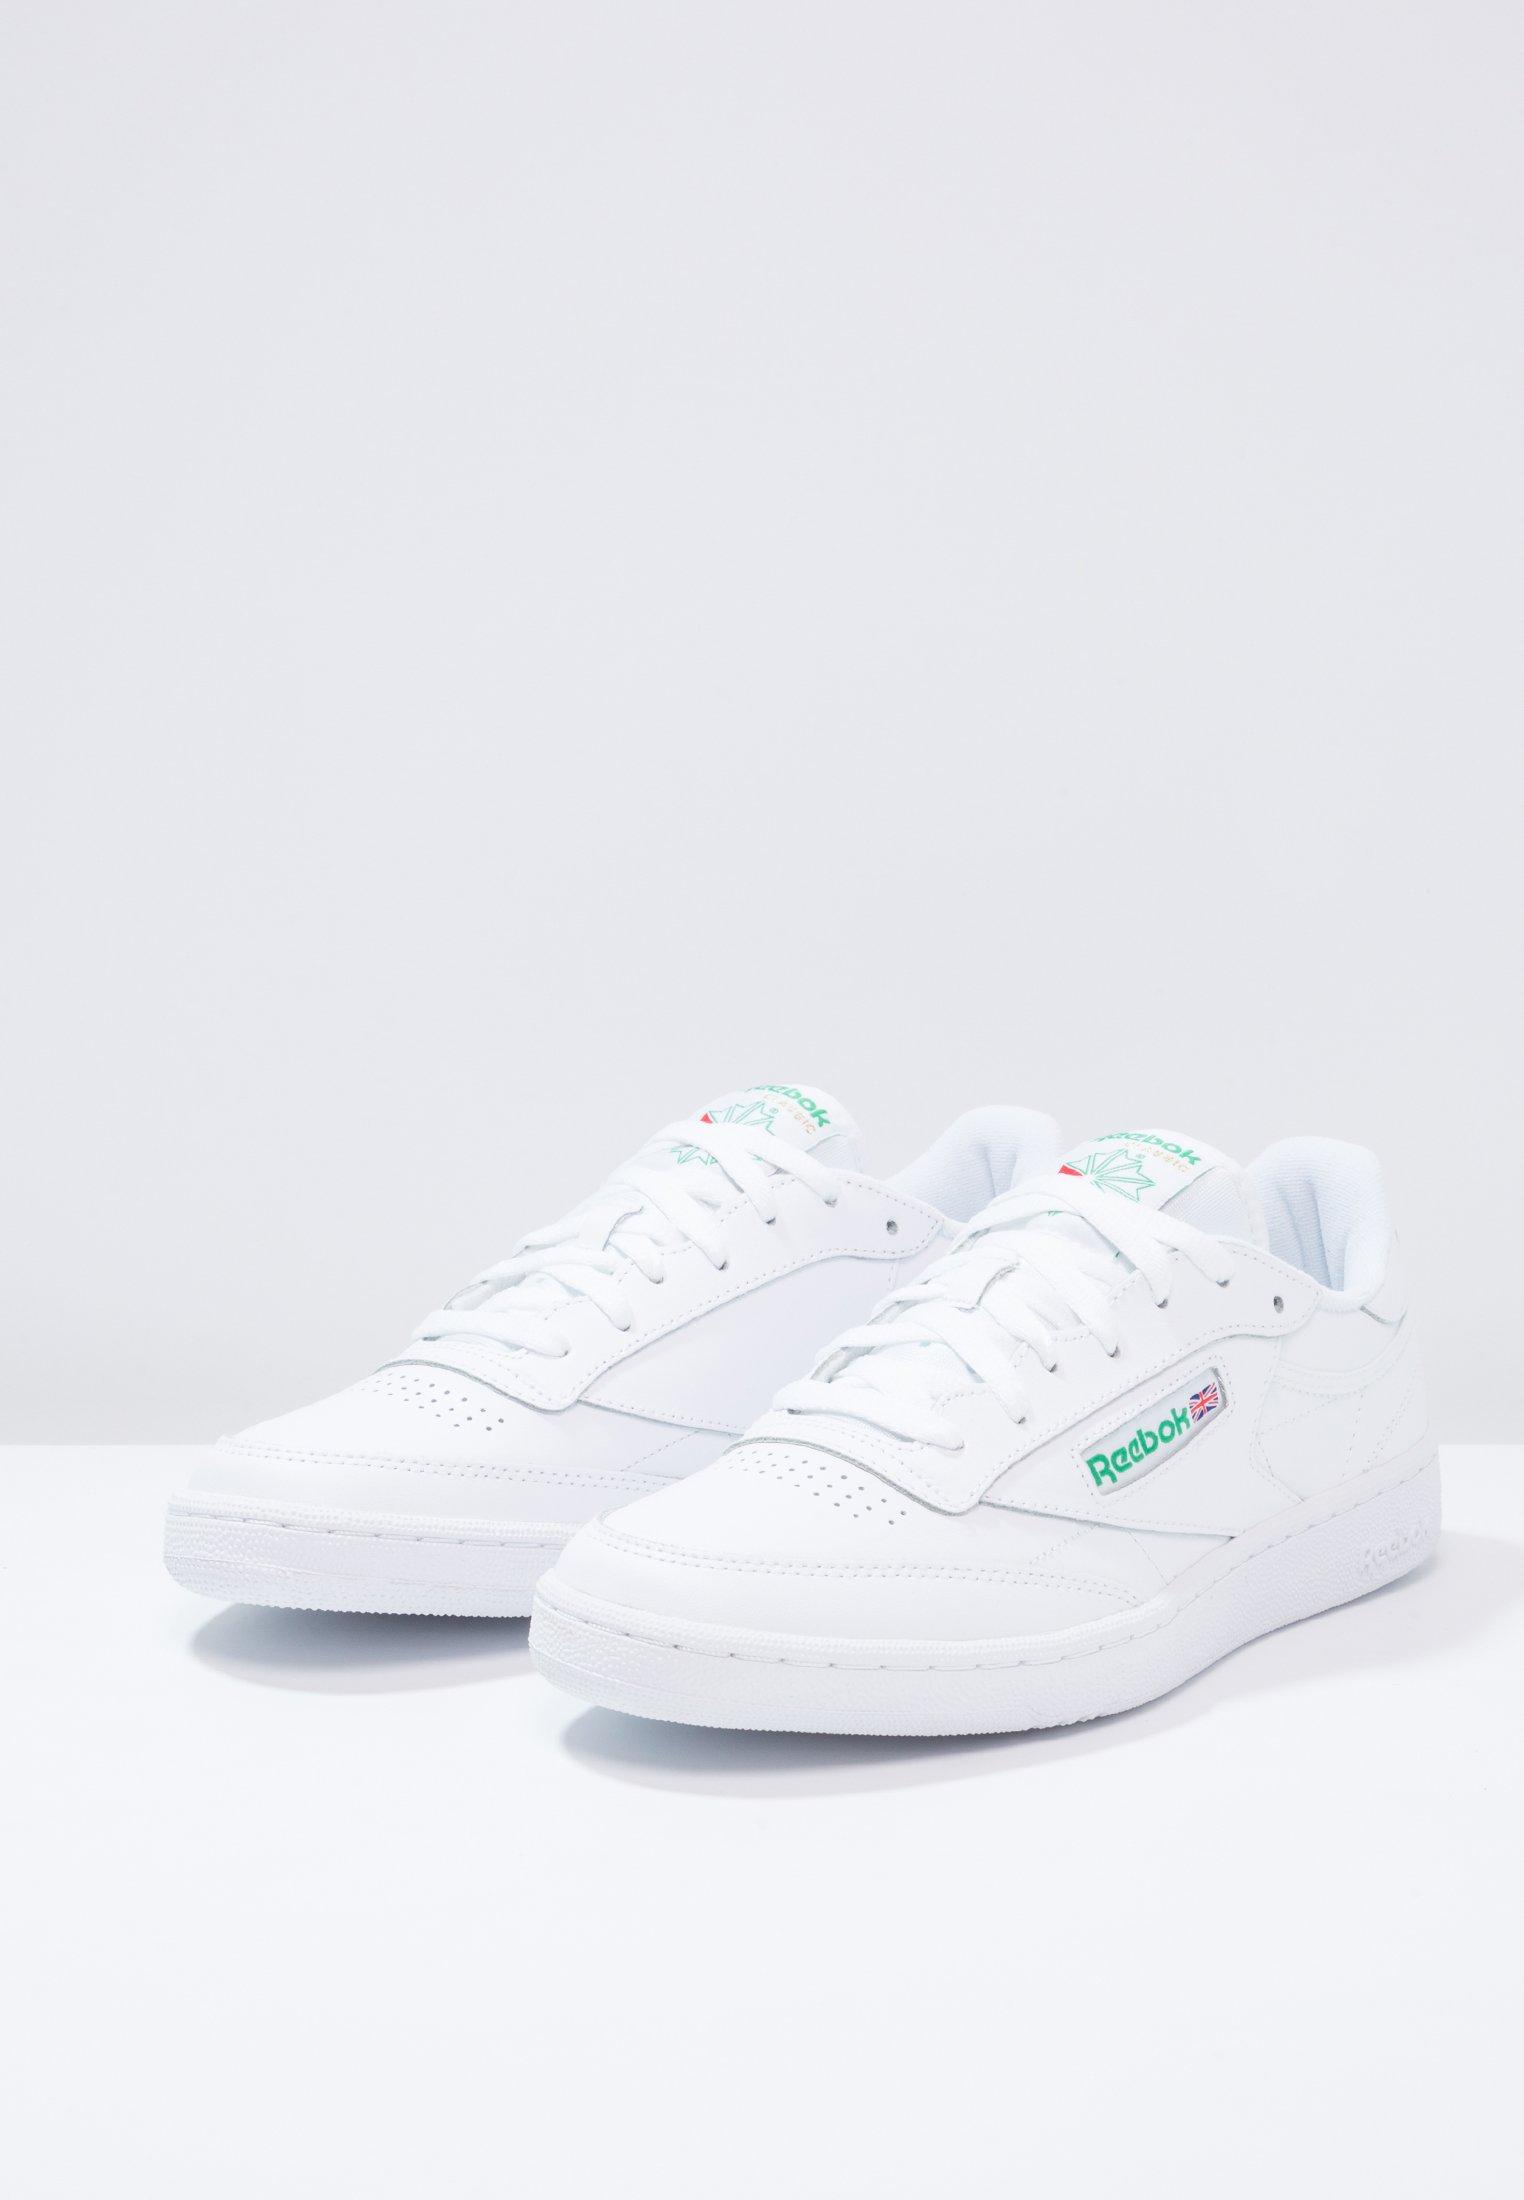 Club Reebok Upper Leather White Classic 85 Basse green C ShoesSneakers bYf6y7vIg